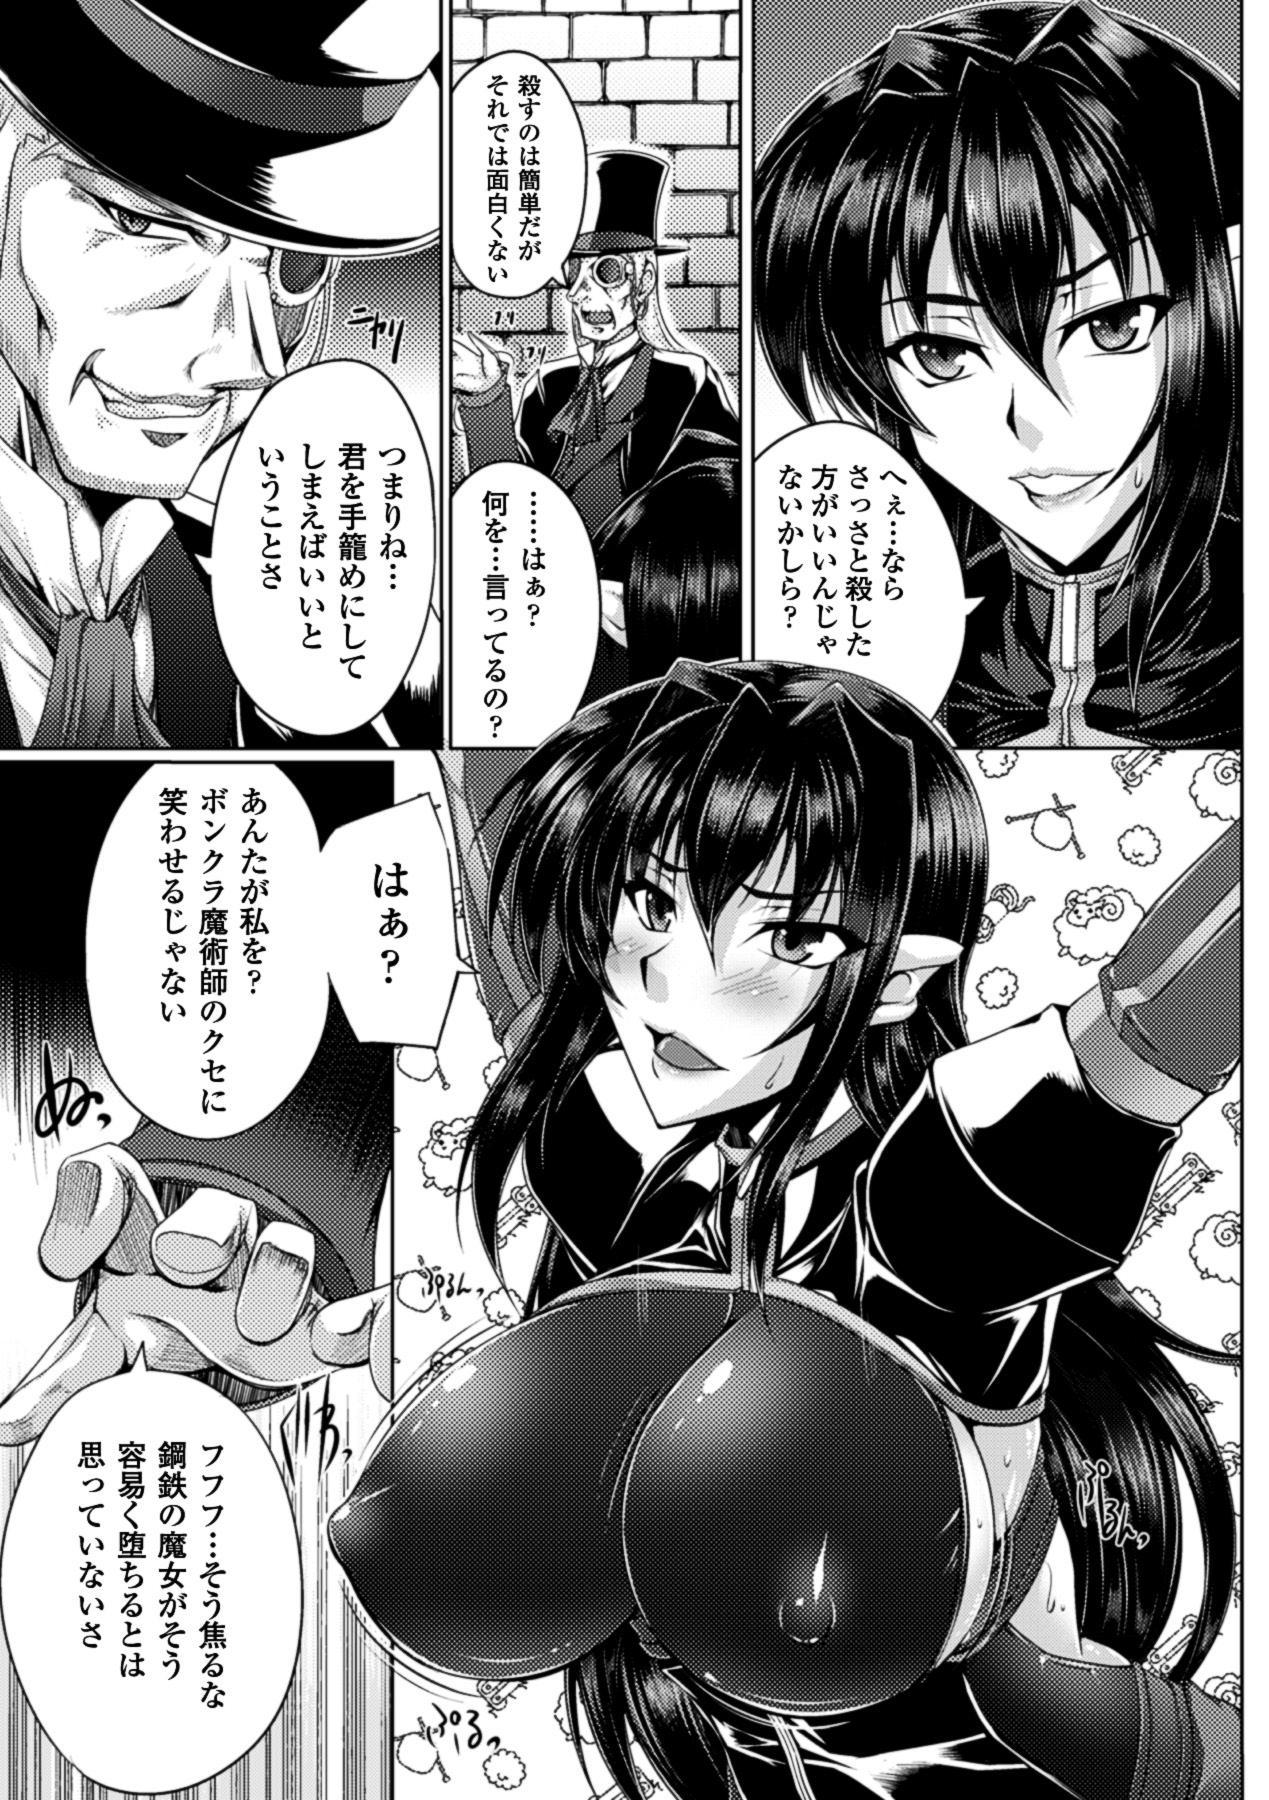 Megami Crisis 10 10